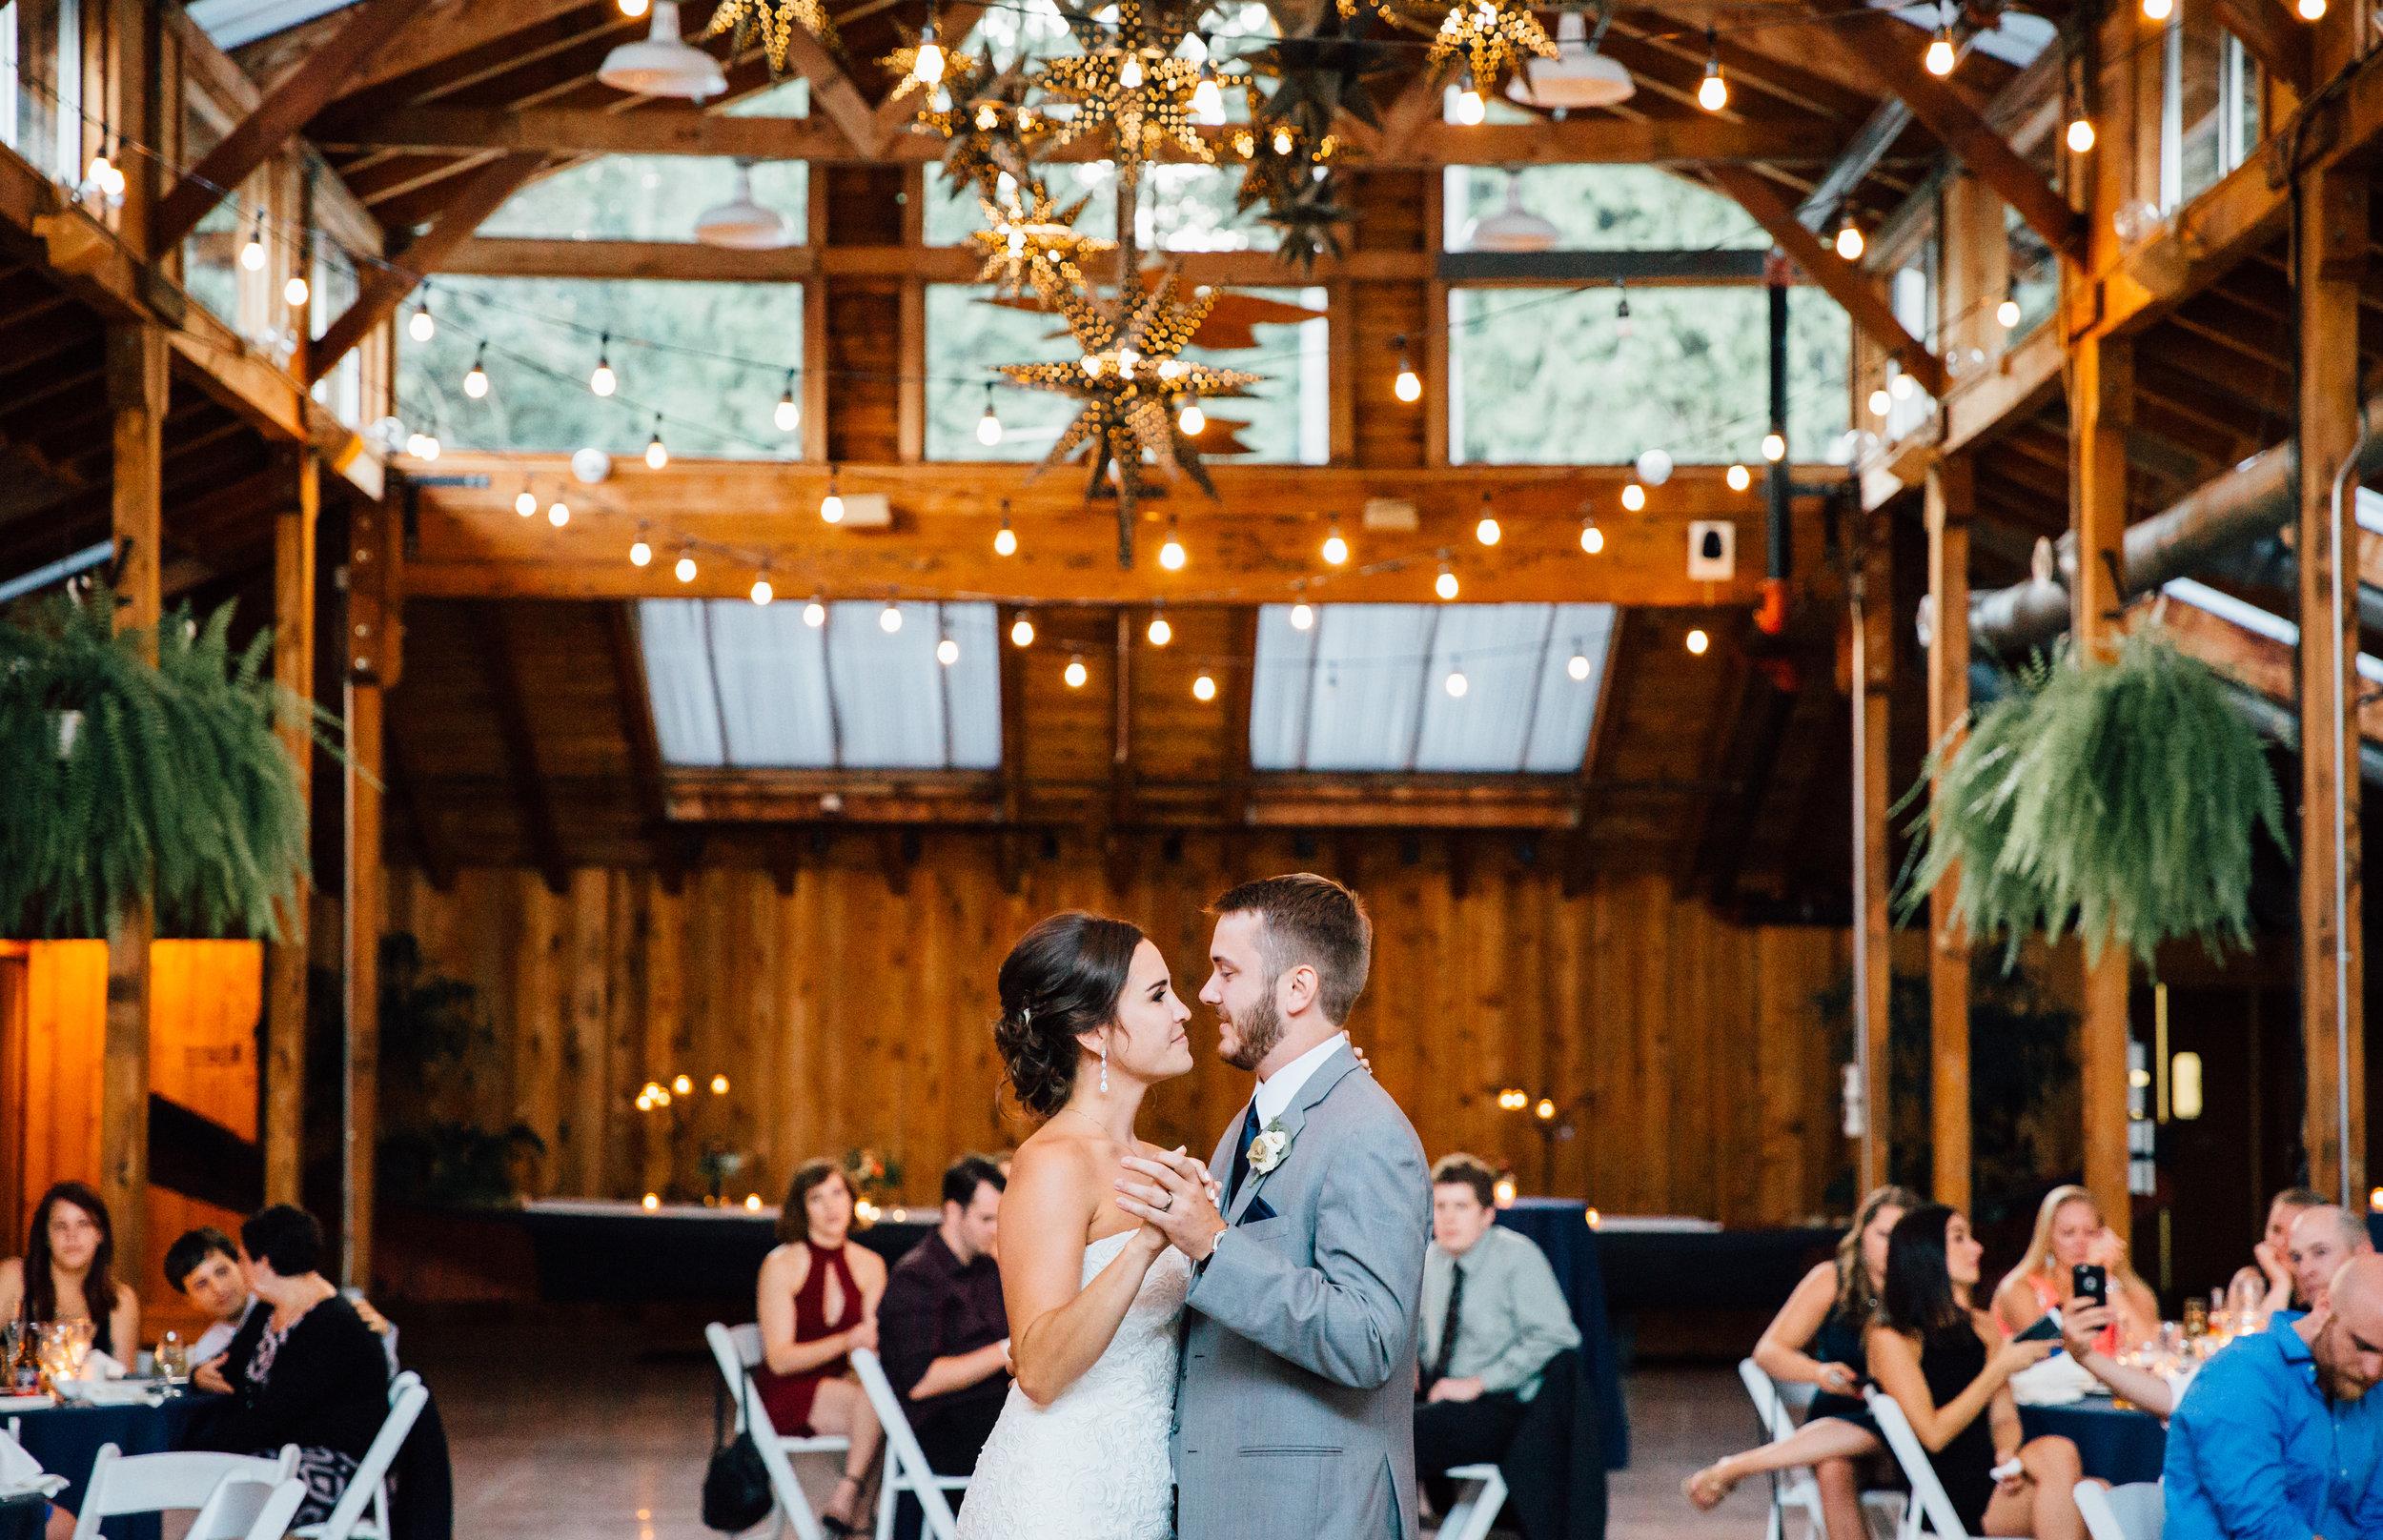 Kiana Lodge Wedding - Seattle Wedding Photographer - Something Minted Photography-771.jpg